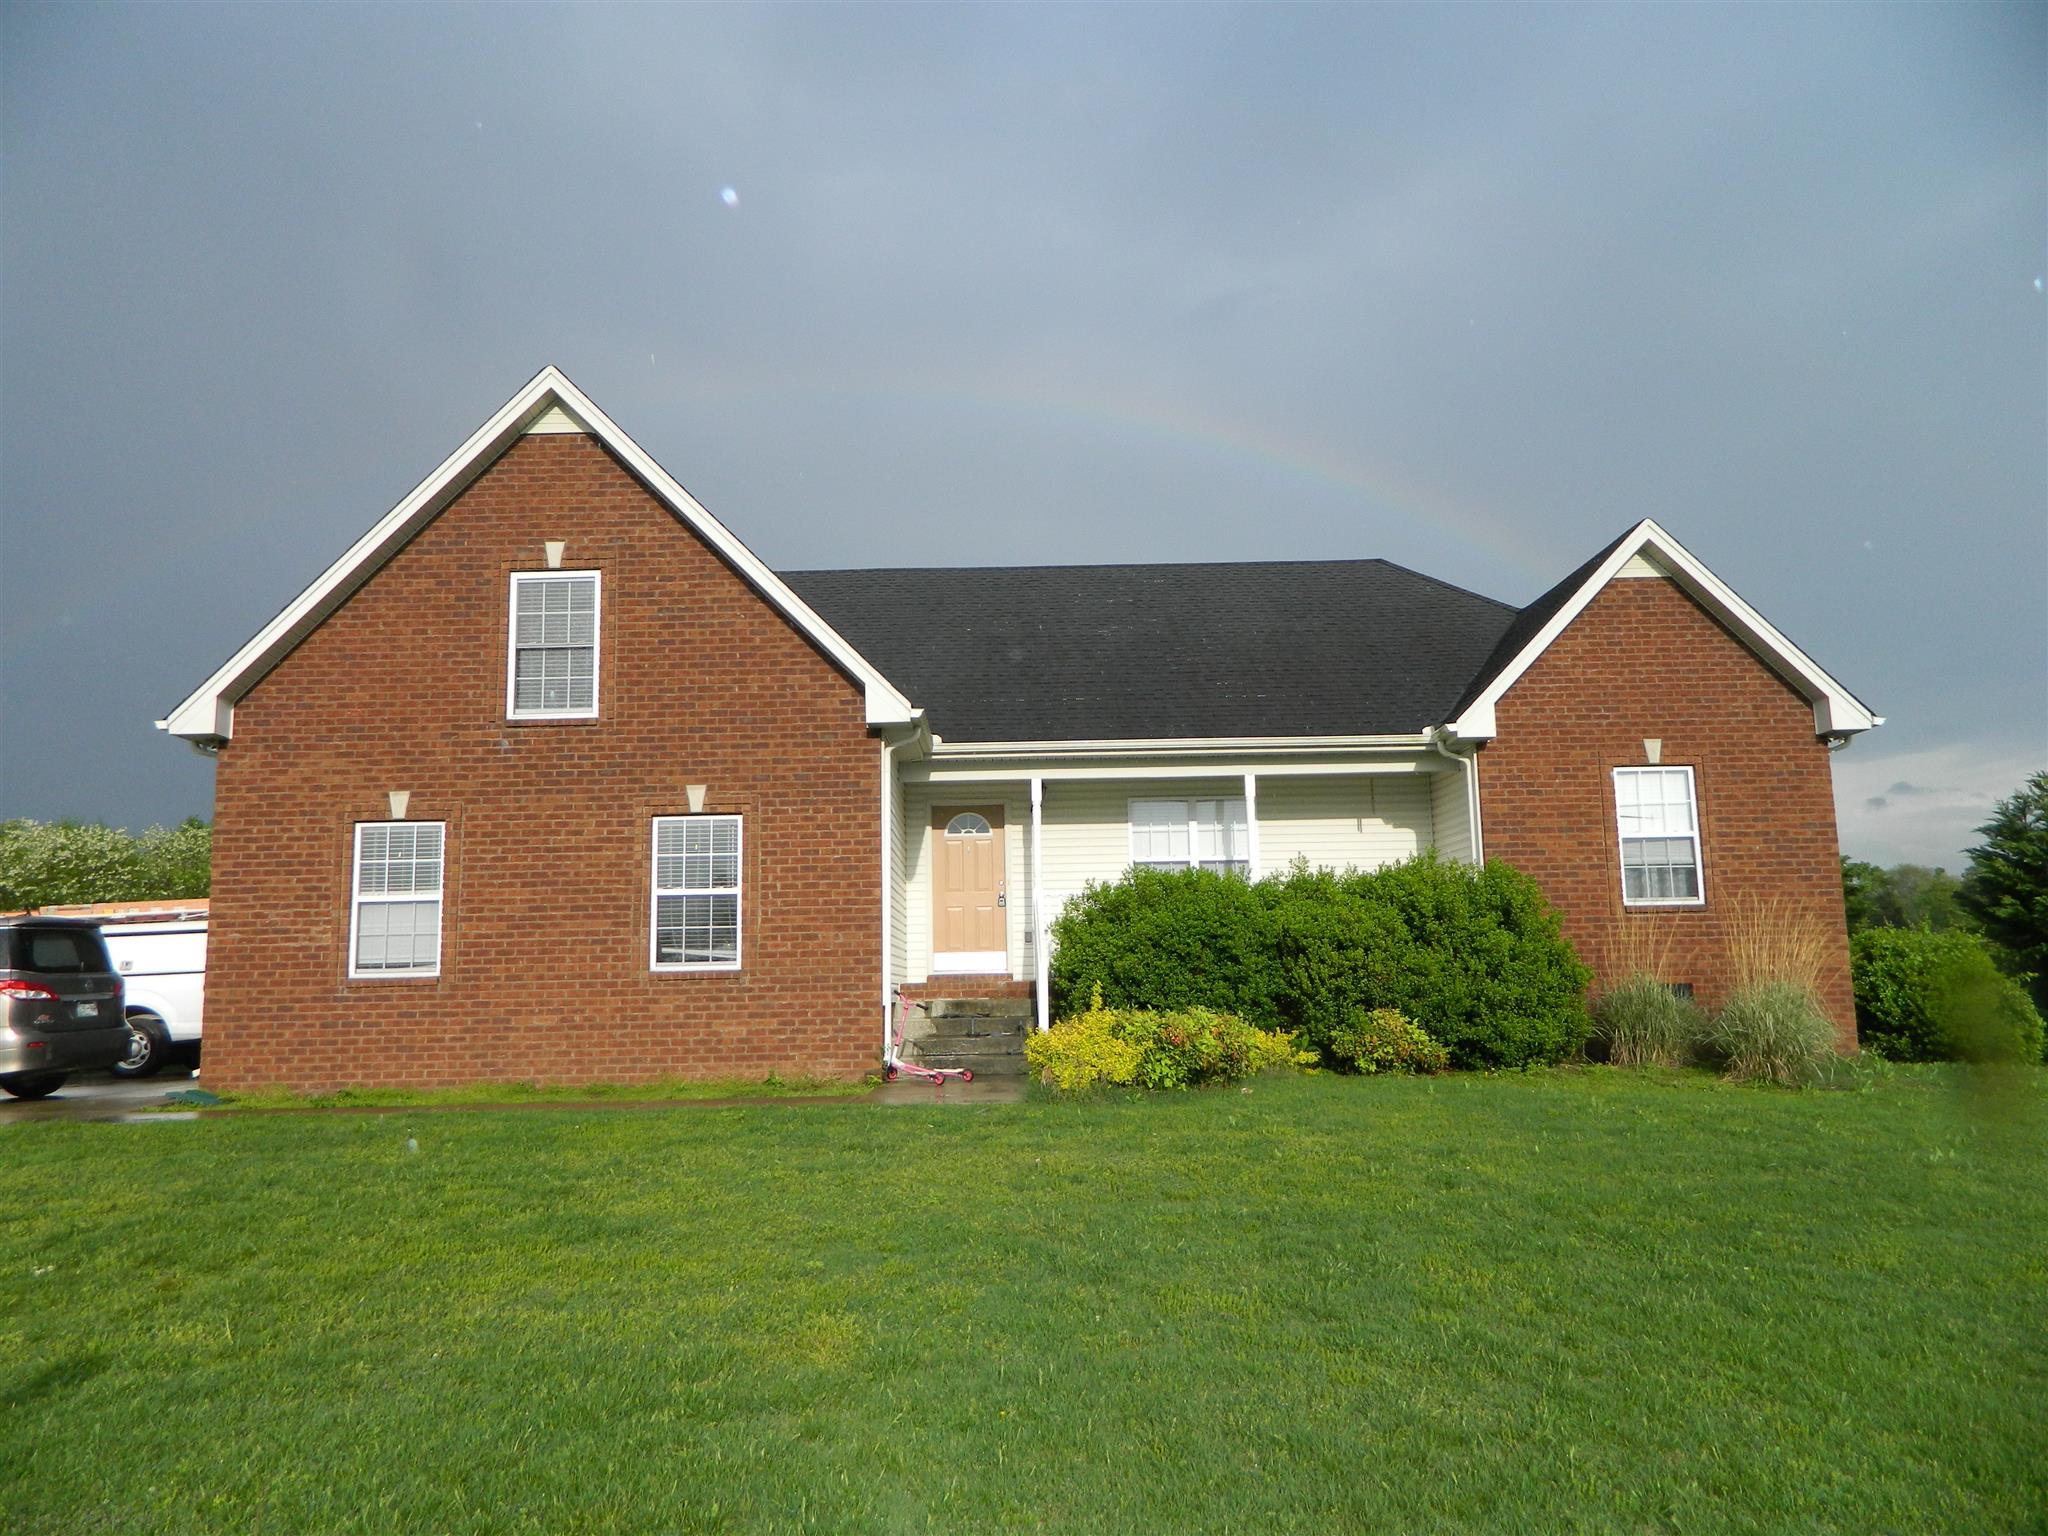 Photo of 3029 Meadowview Ct  Cross Plains  TN